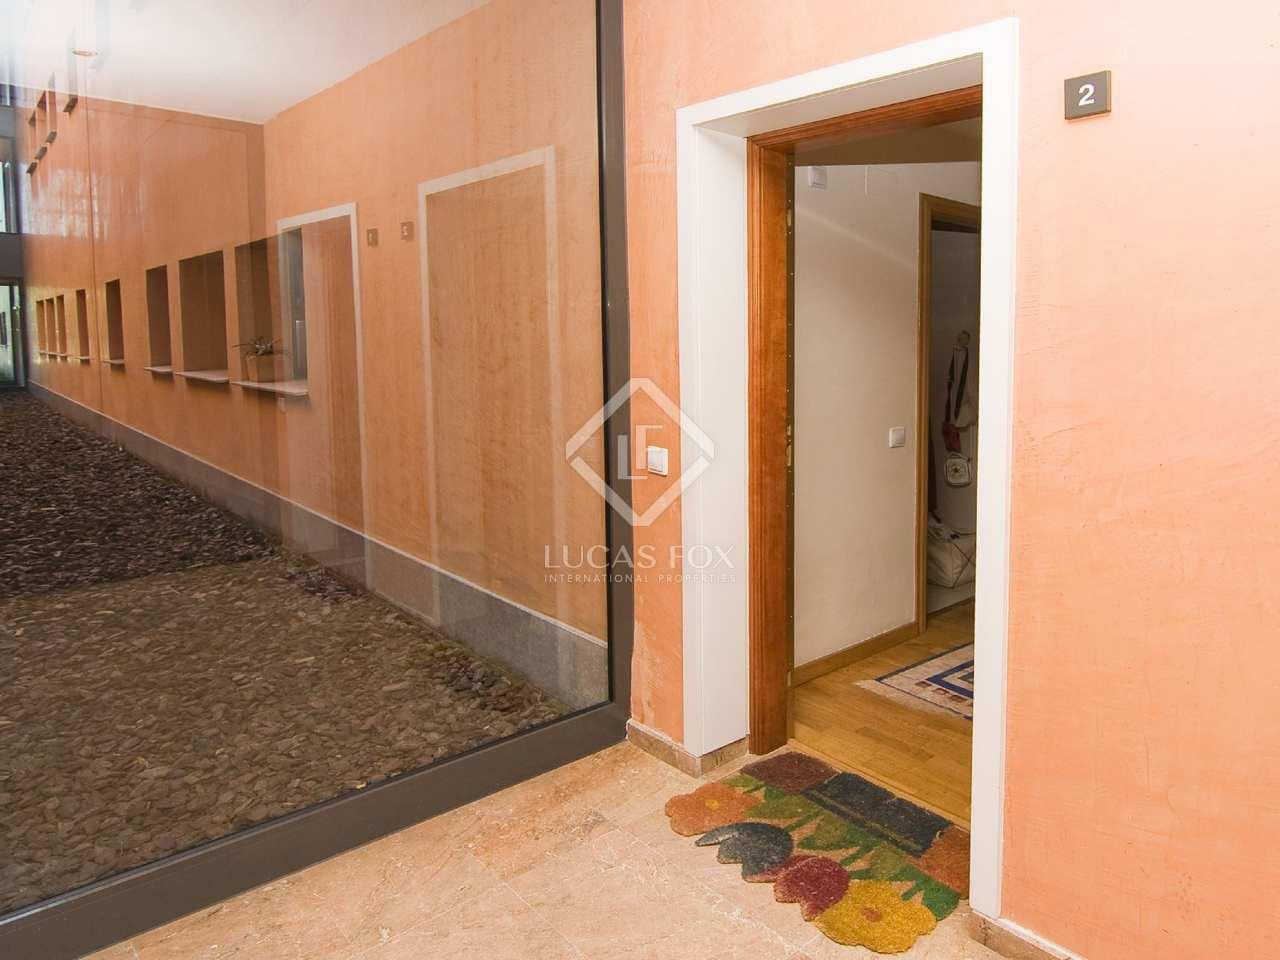 Moderno apartamento en venta en gav mar castelldefels - Piso en gava mar ...